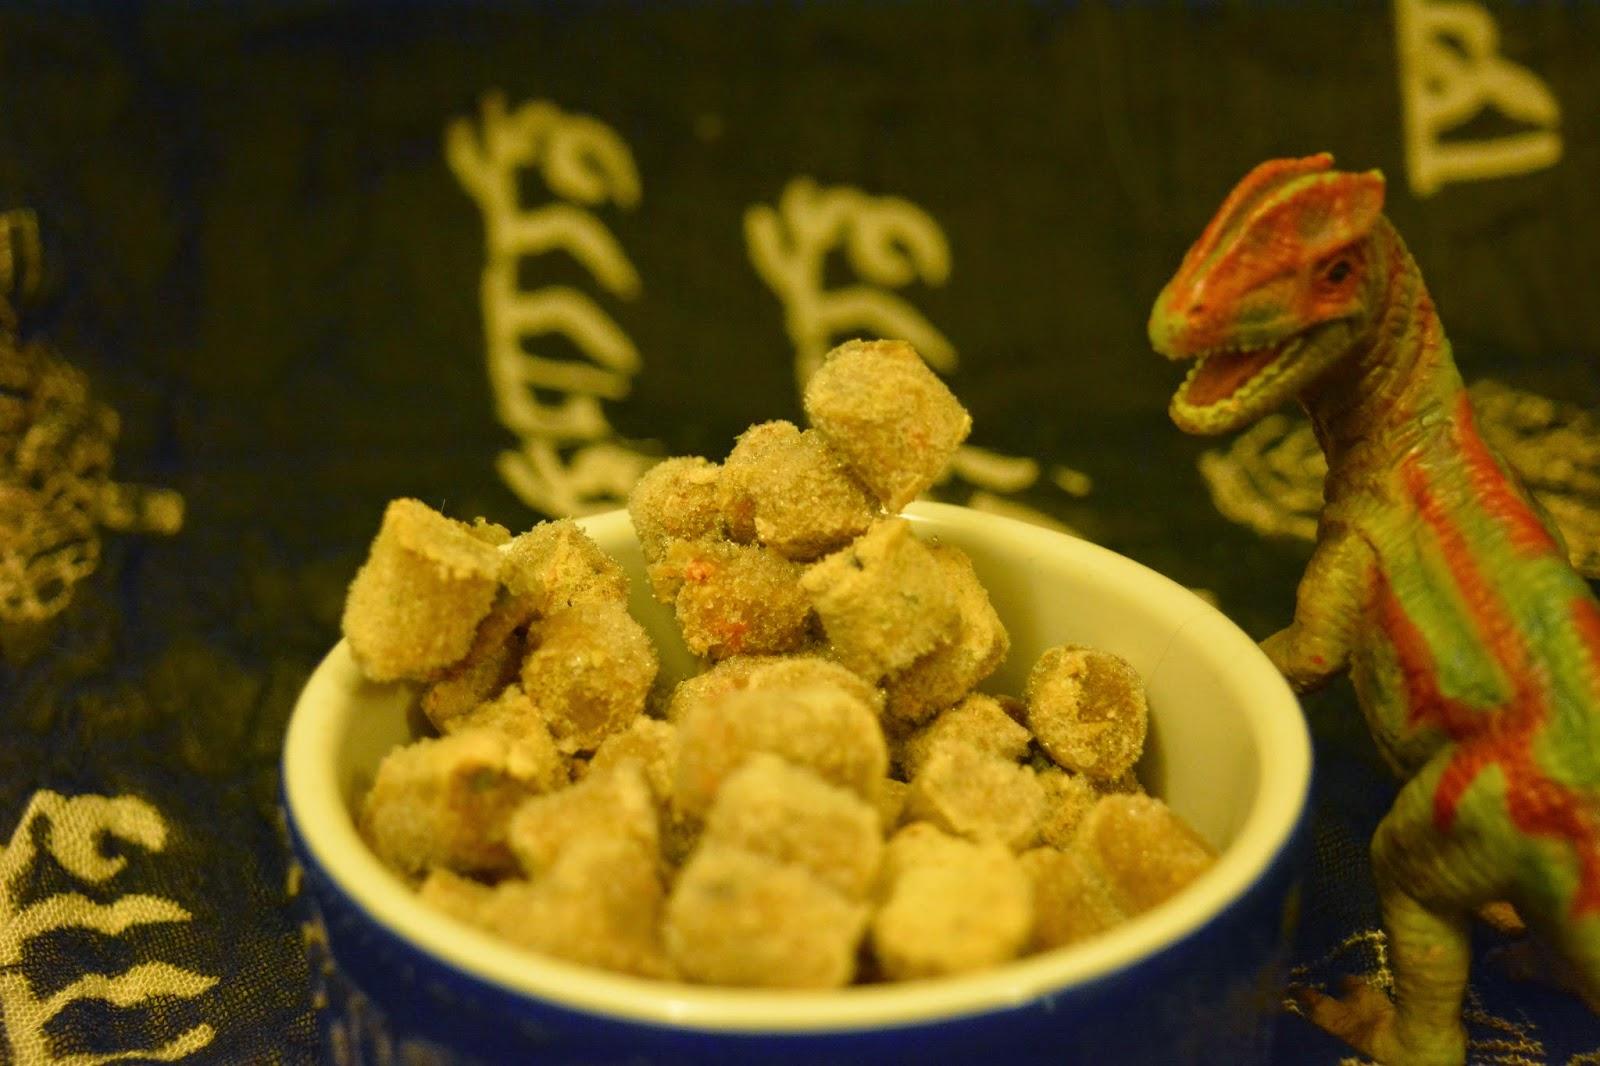 Primal Raw Rabbit Cat Food